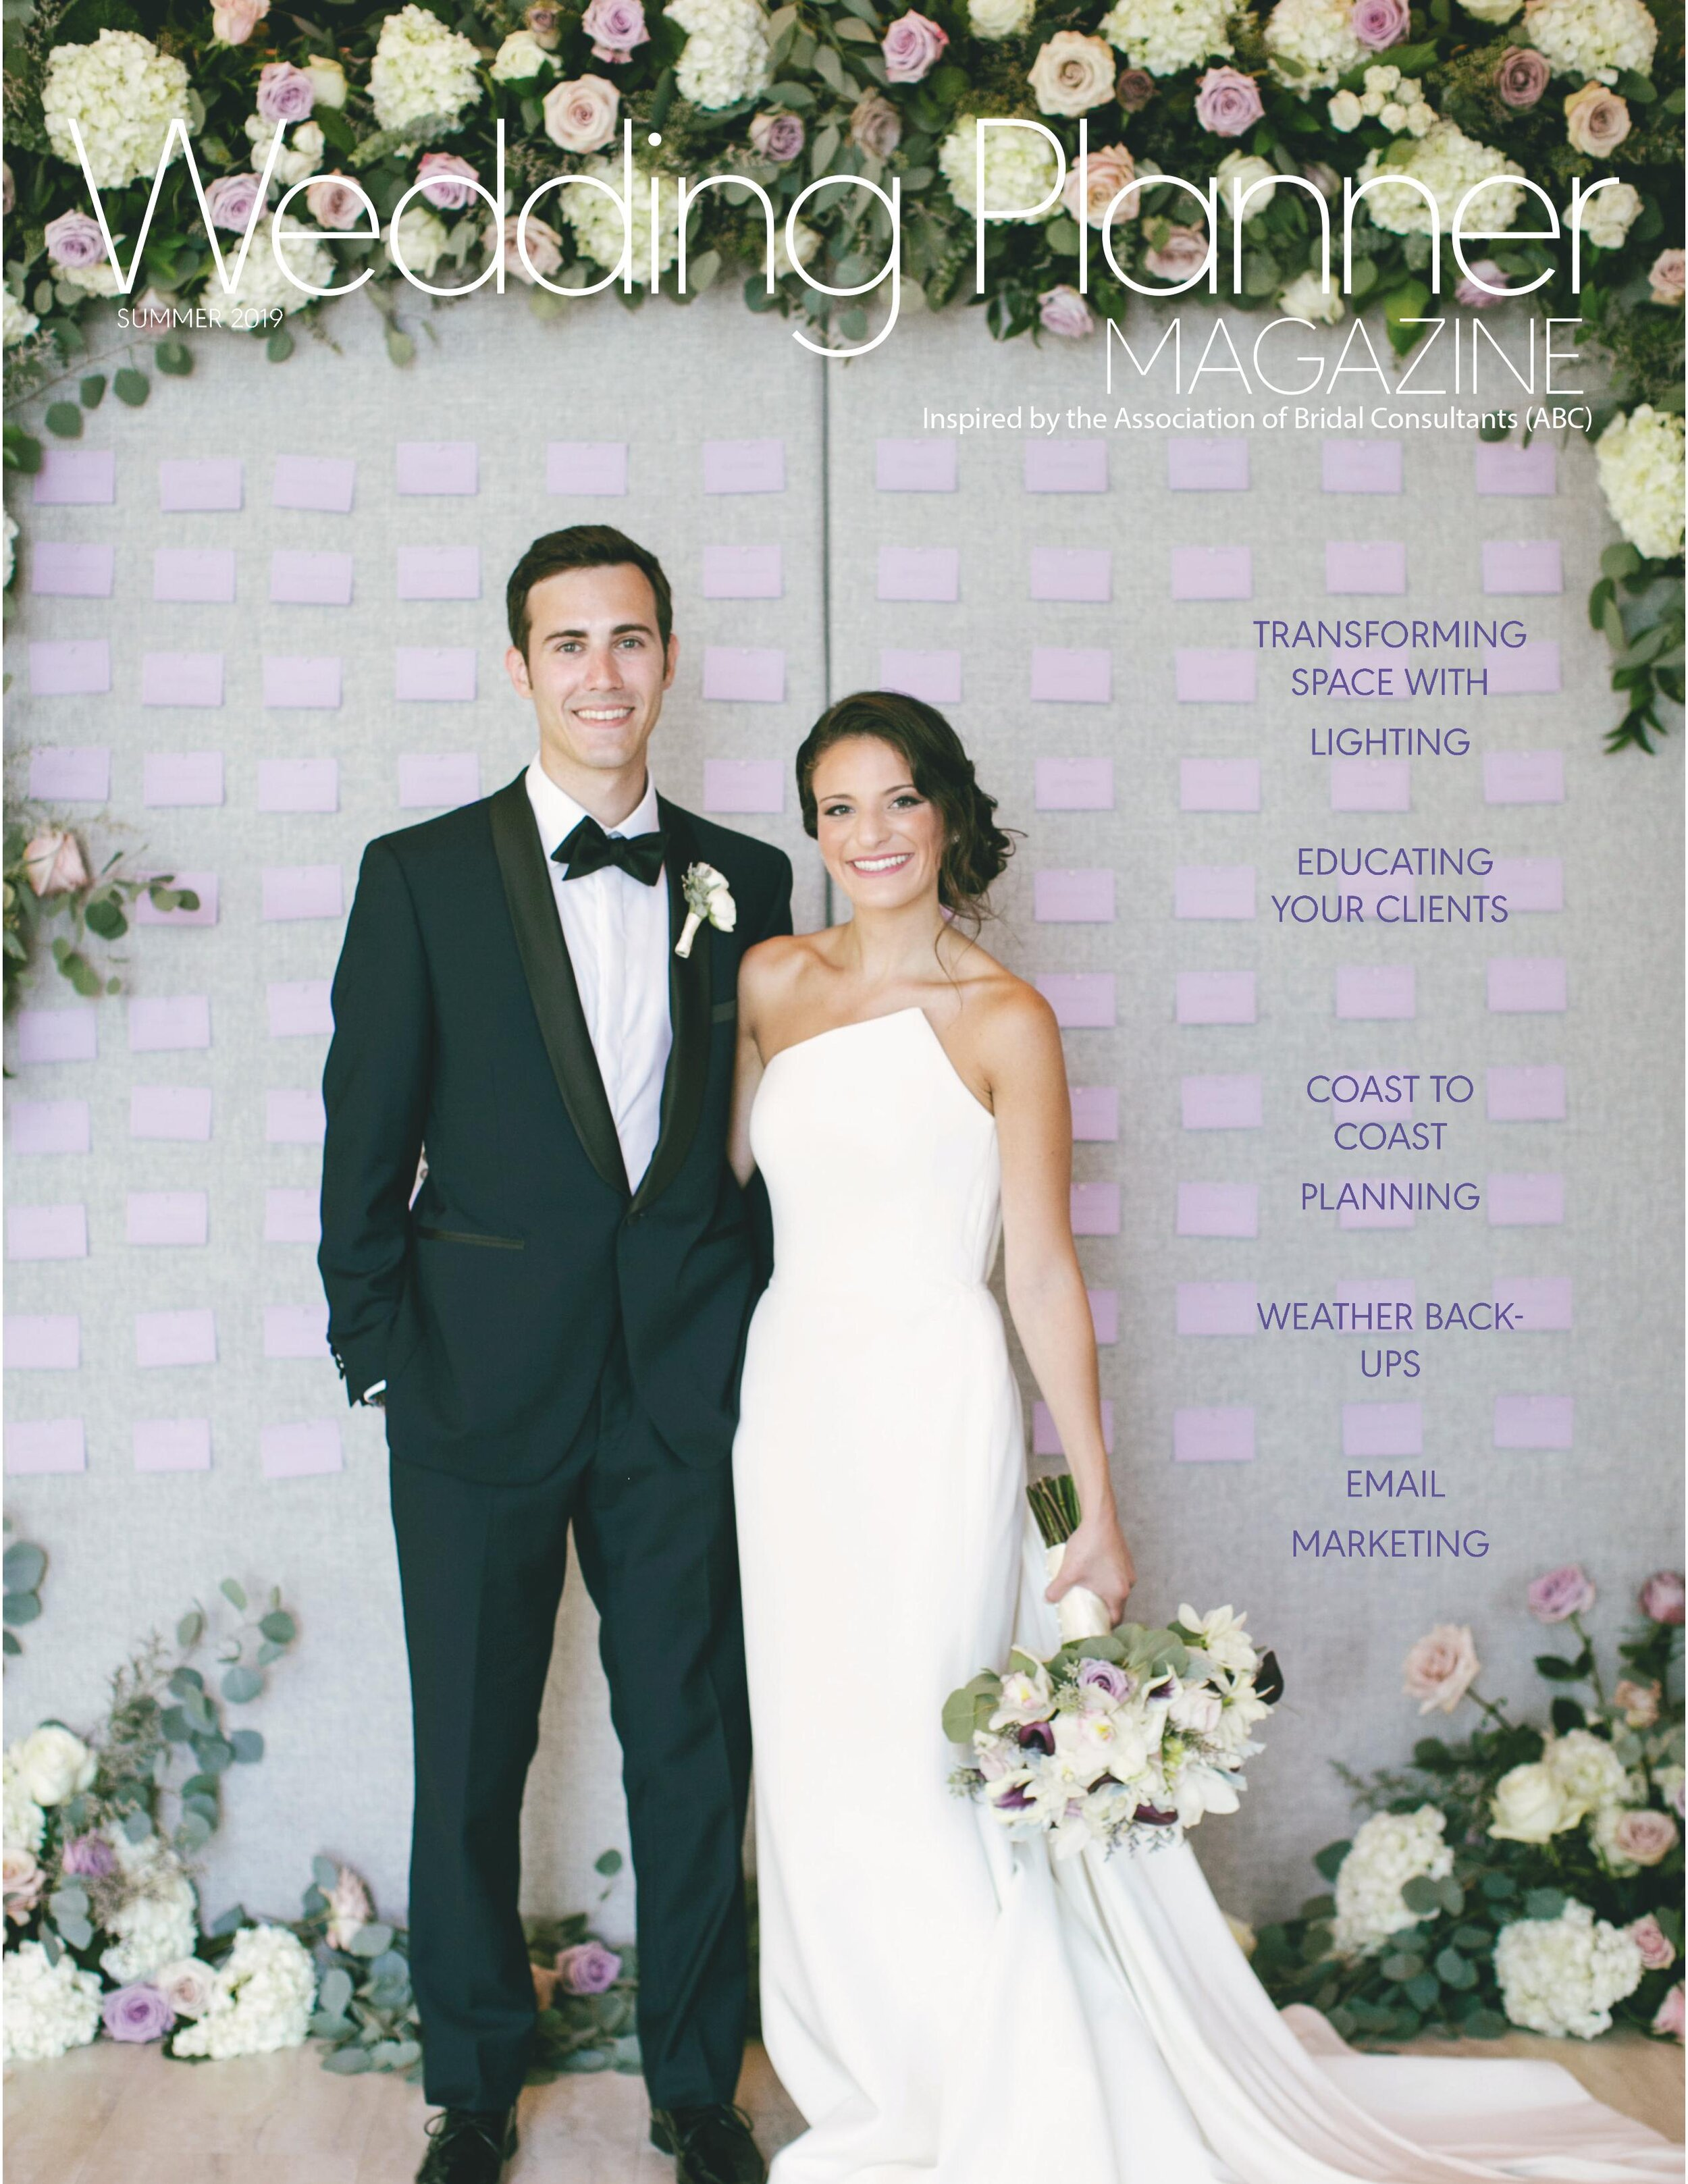 Ask the Experts - Summer 2019 Wedding Planner Magazine - pg 1.jpg